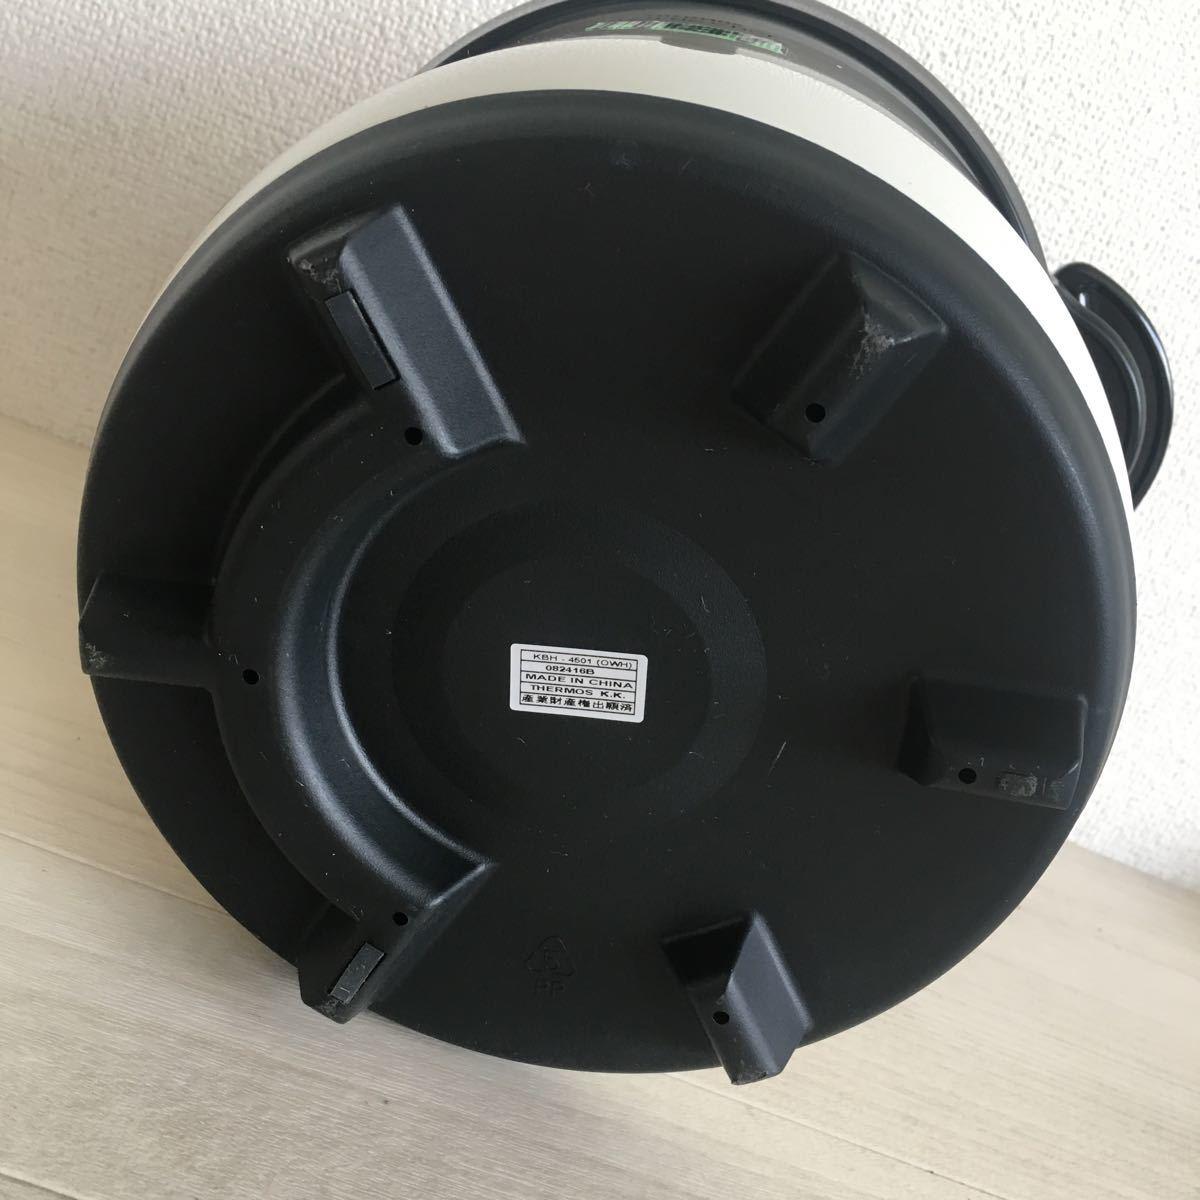 (H187)美品 THERMOS/サーモス 真空保温調理器 シャトルシェフ KBH-4501( OWH)_画像9